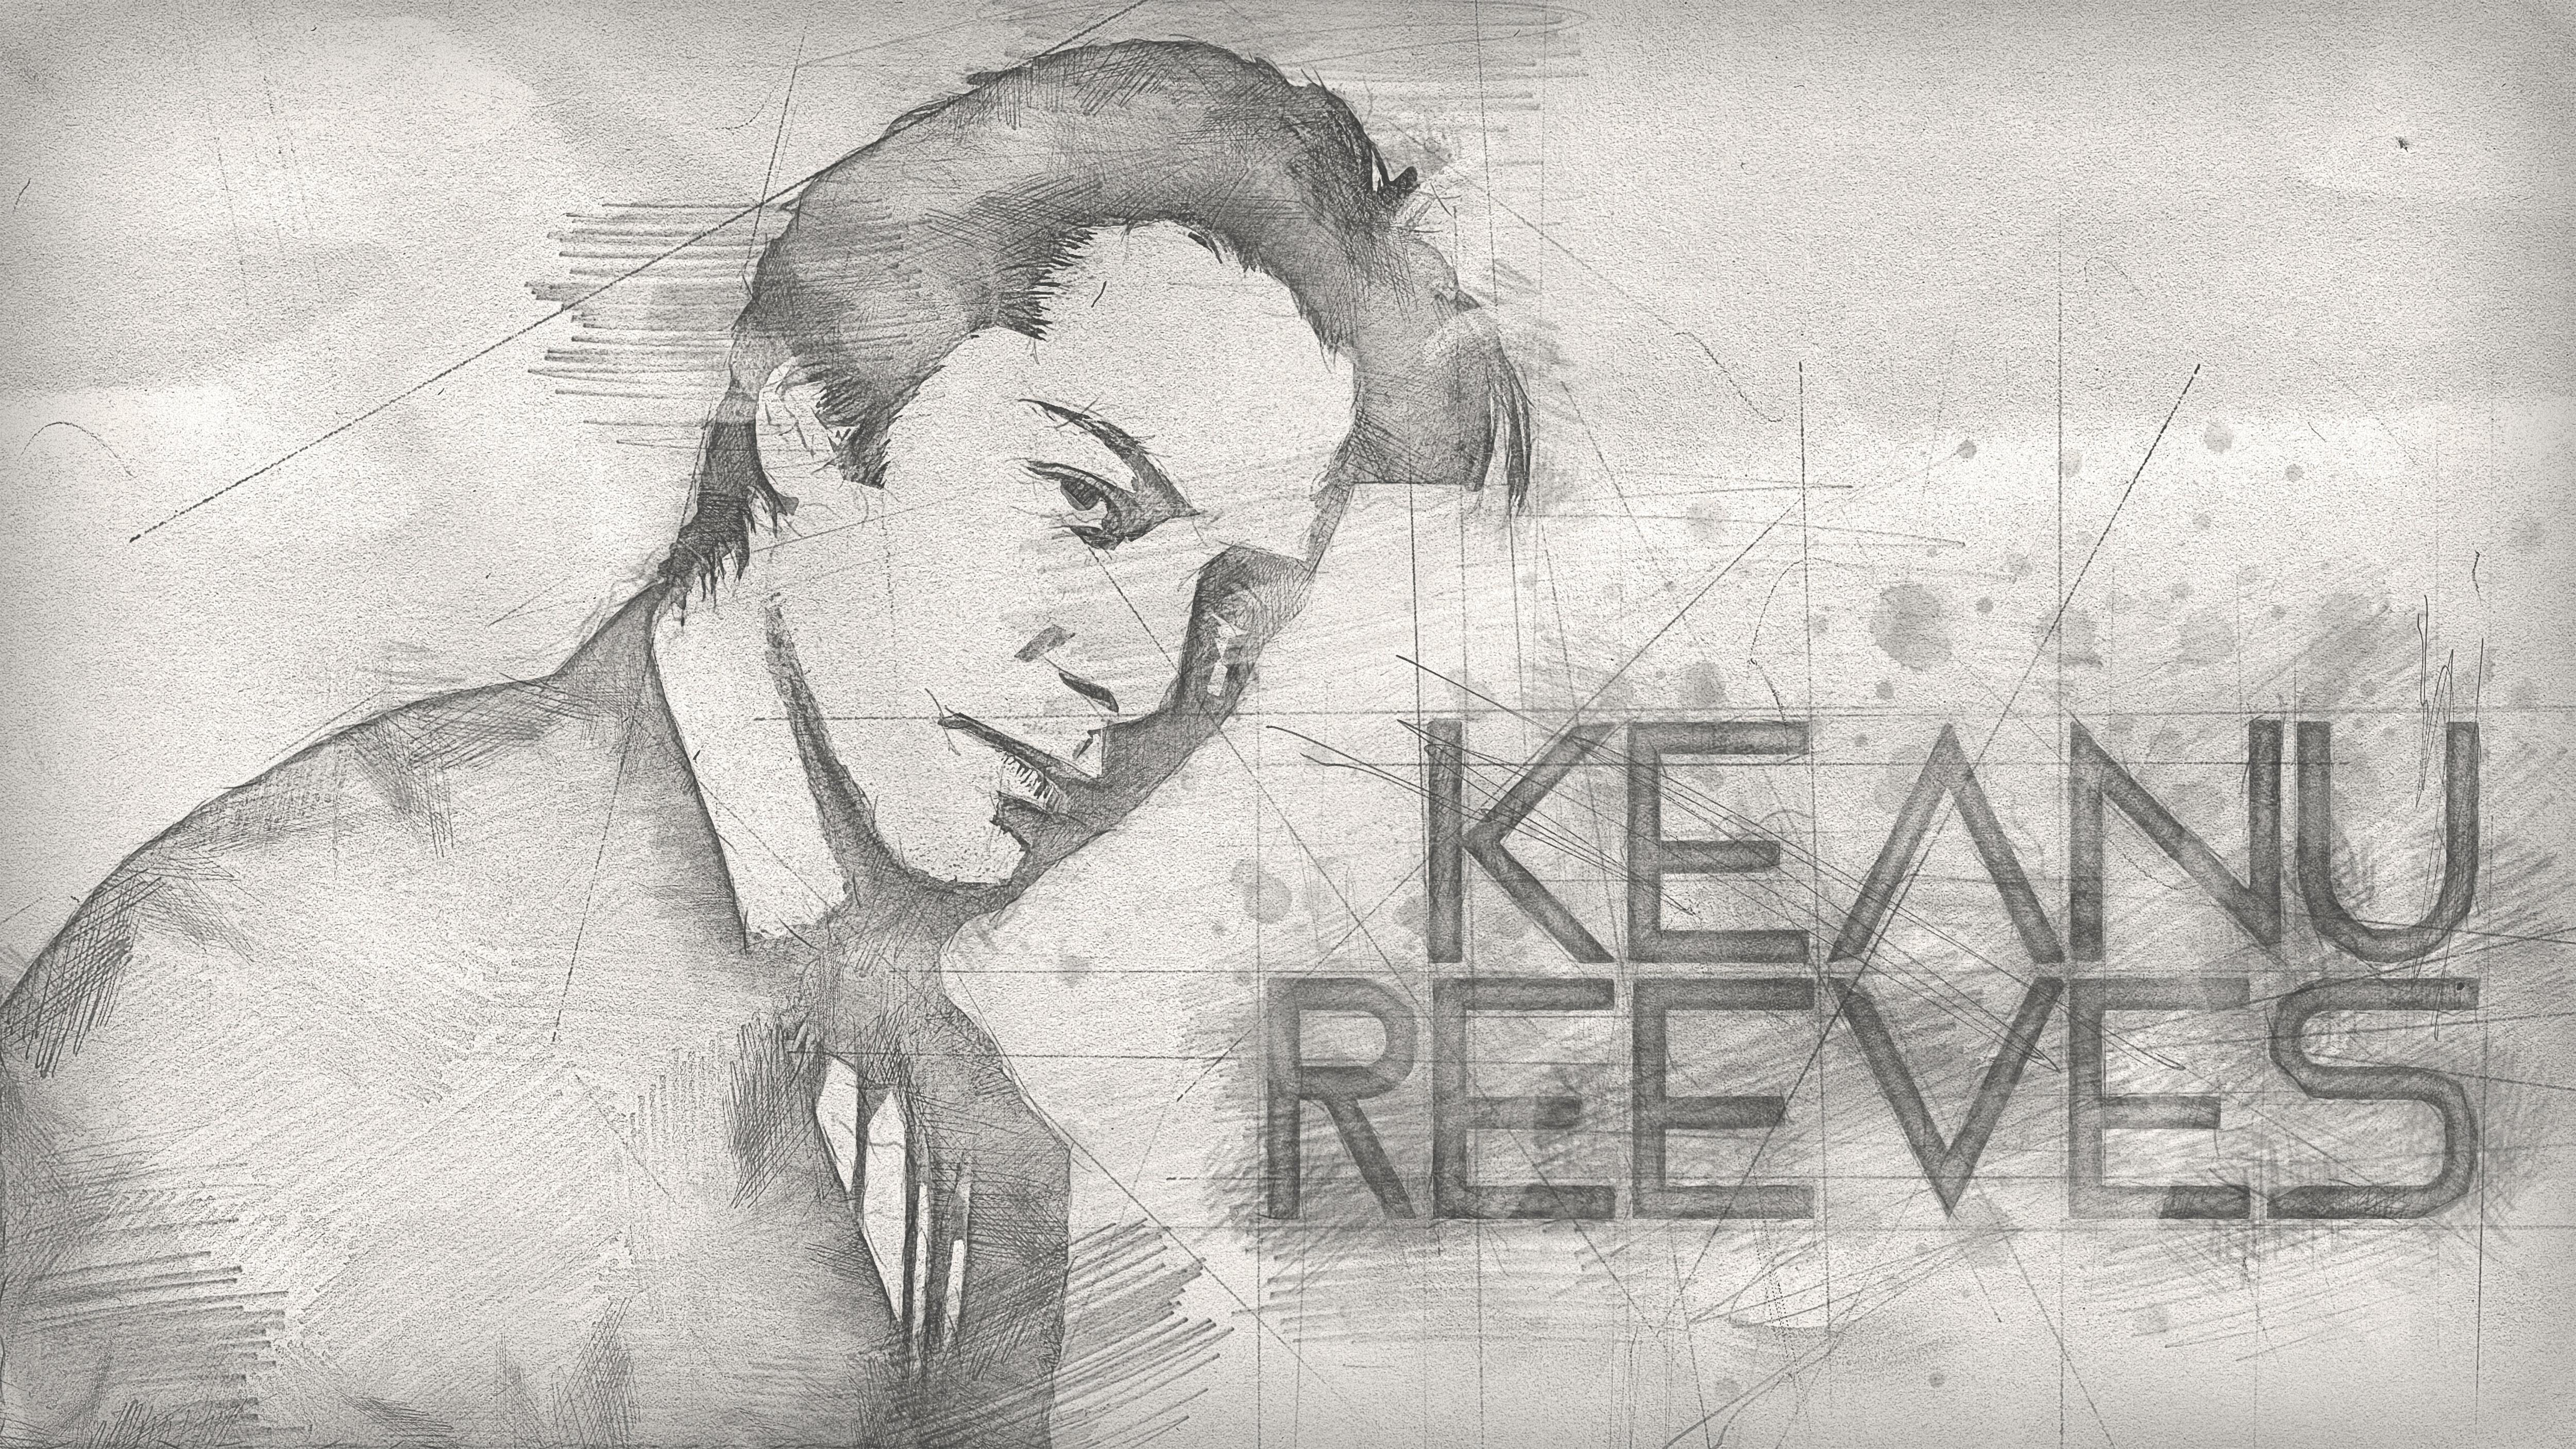 Foto Stok Gratis Tentang Keanu Reeves Latar Belakang Pensil